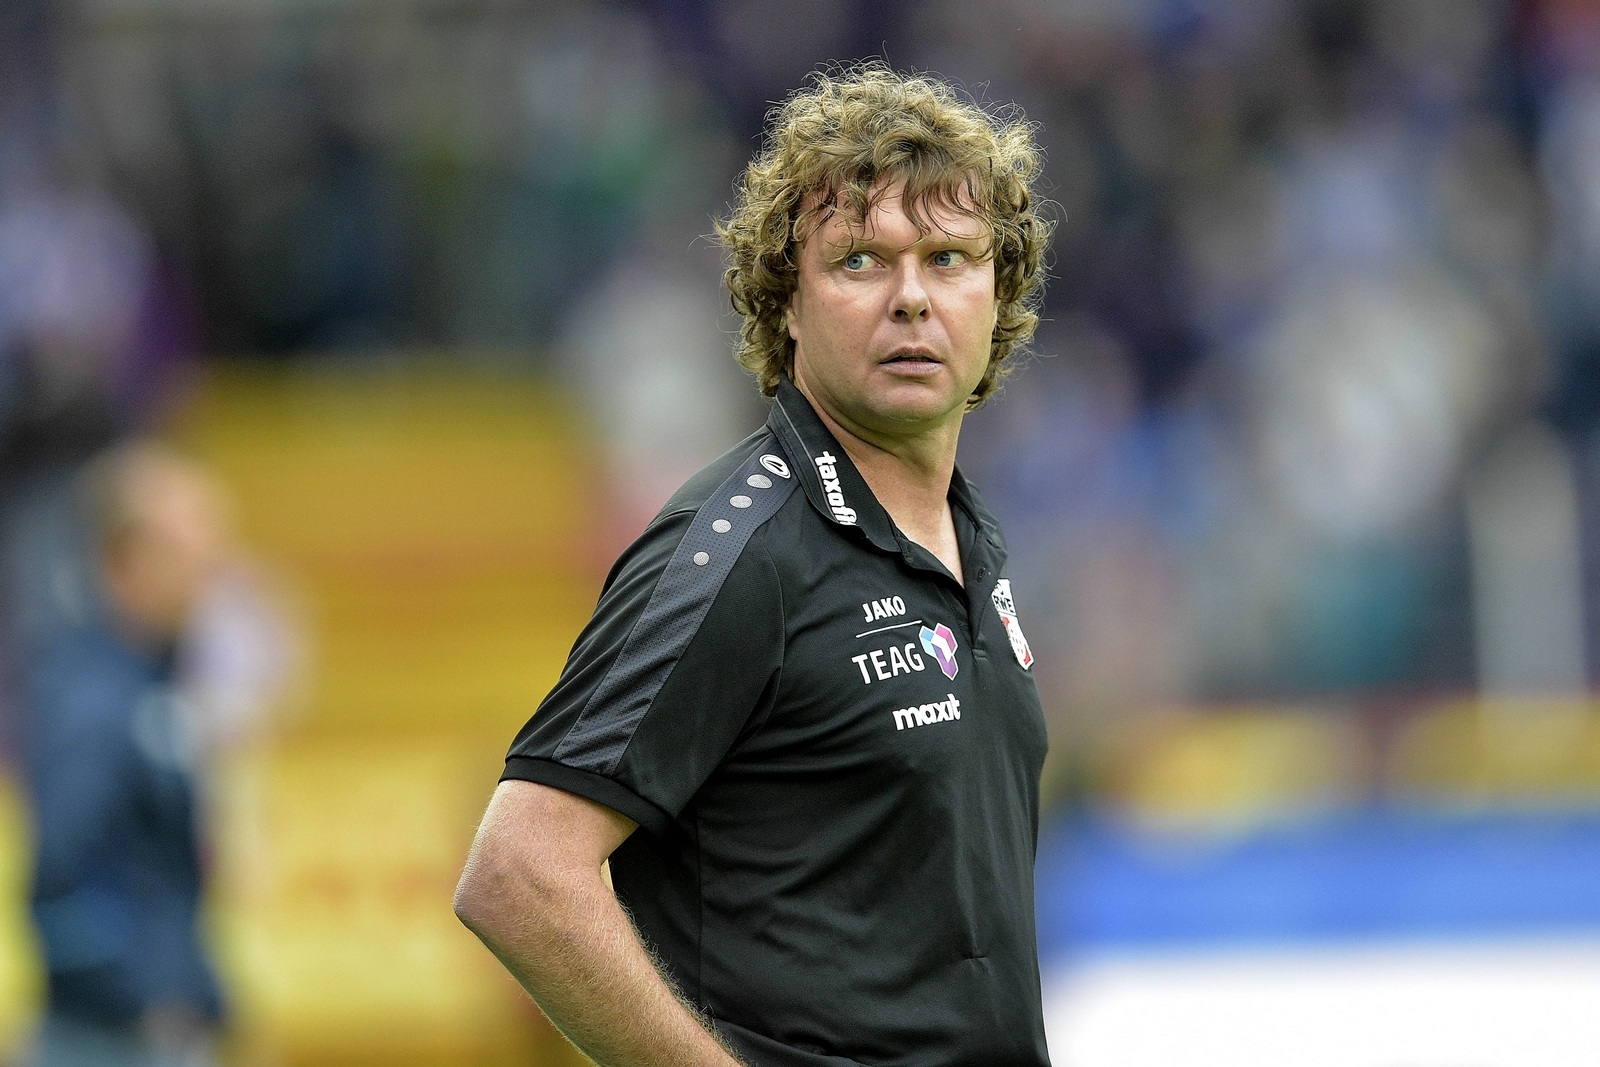 Muss liefern: RWE-Coach Stefan Krämer